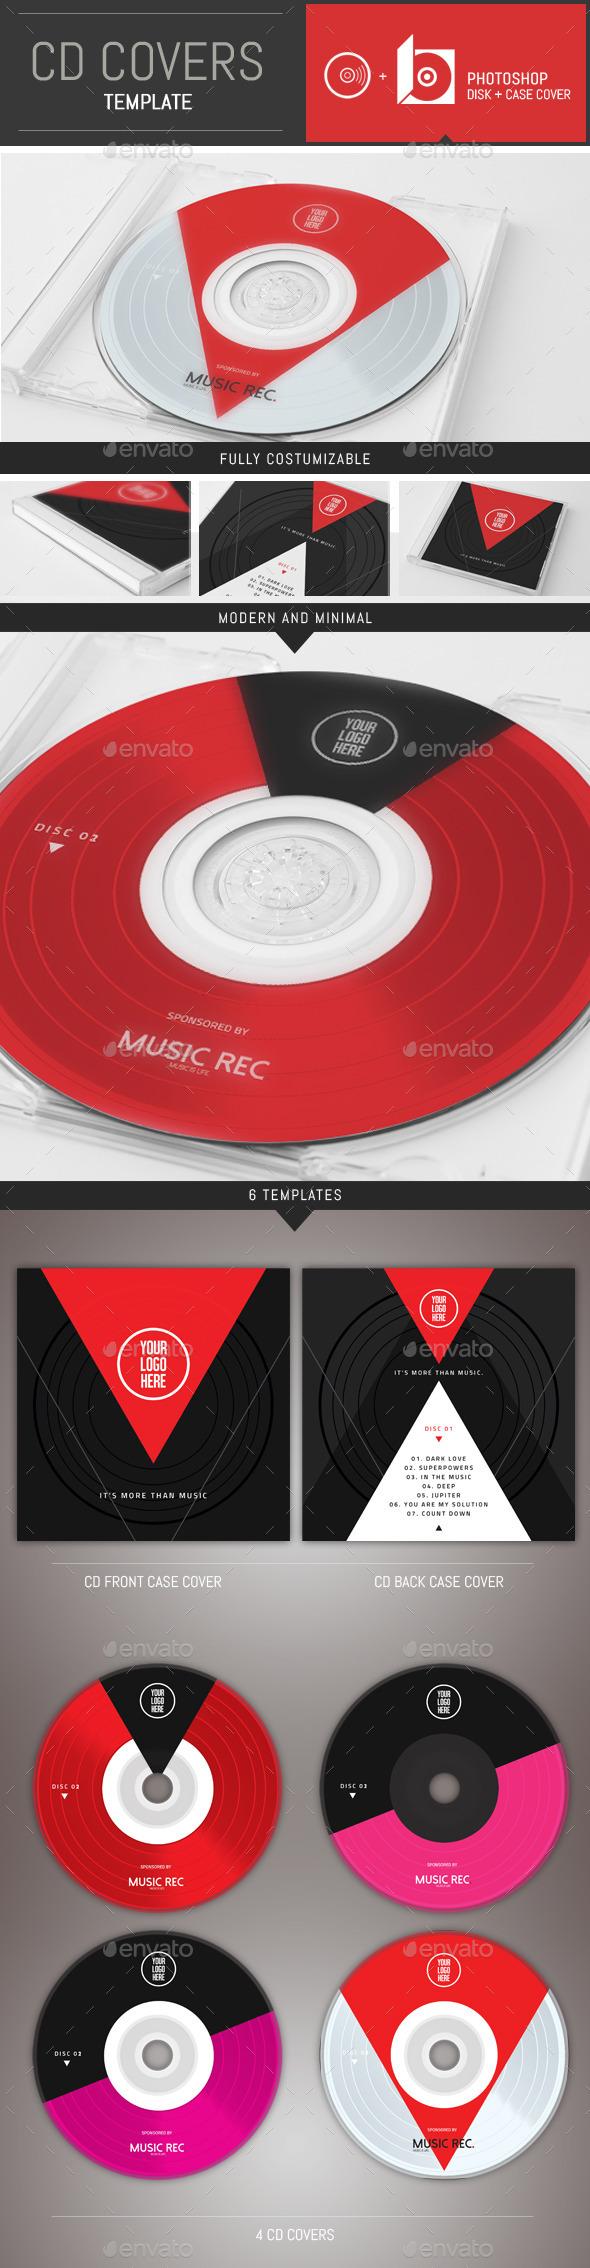 Minimal Music CD Cover Template - CD & DVD Artwork Print Templates